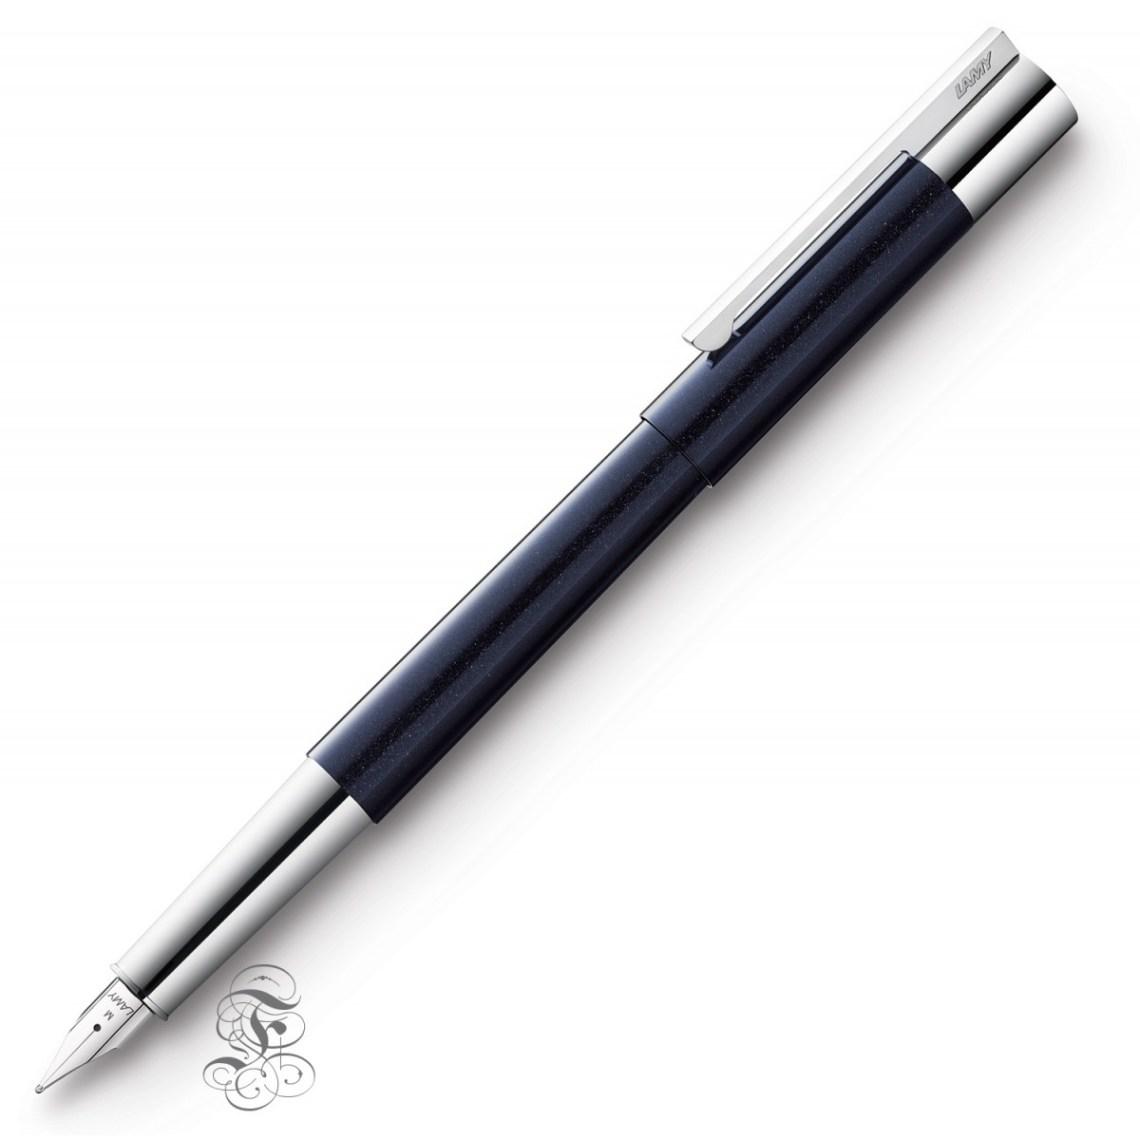 lamy-scala-blueblack-fountain-pen-special-edition-2015